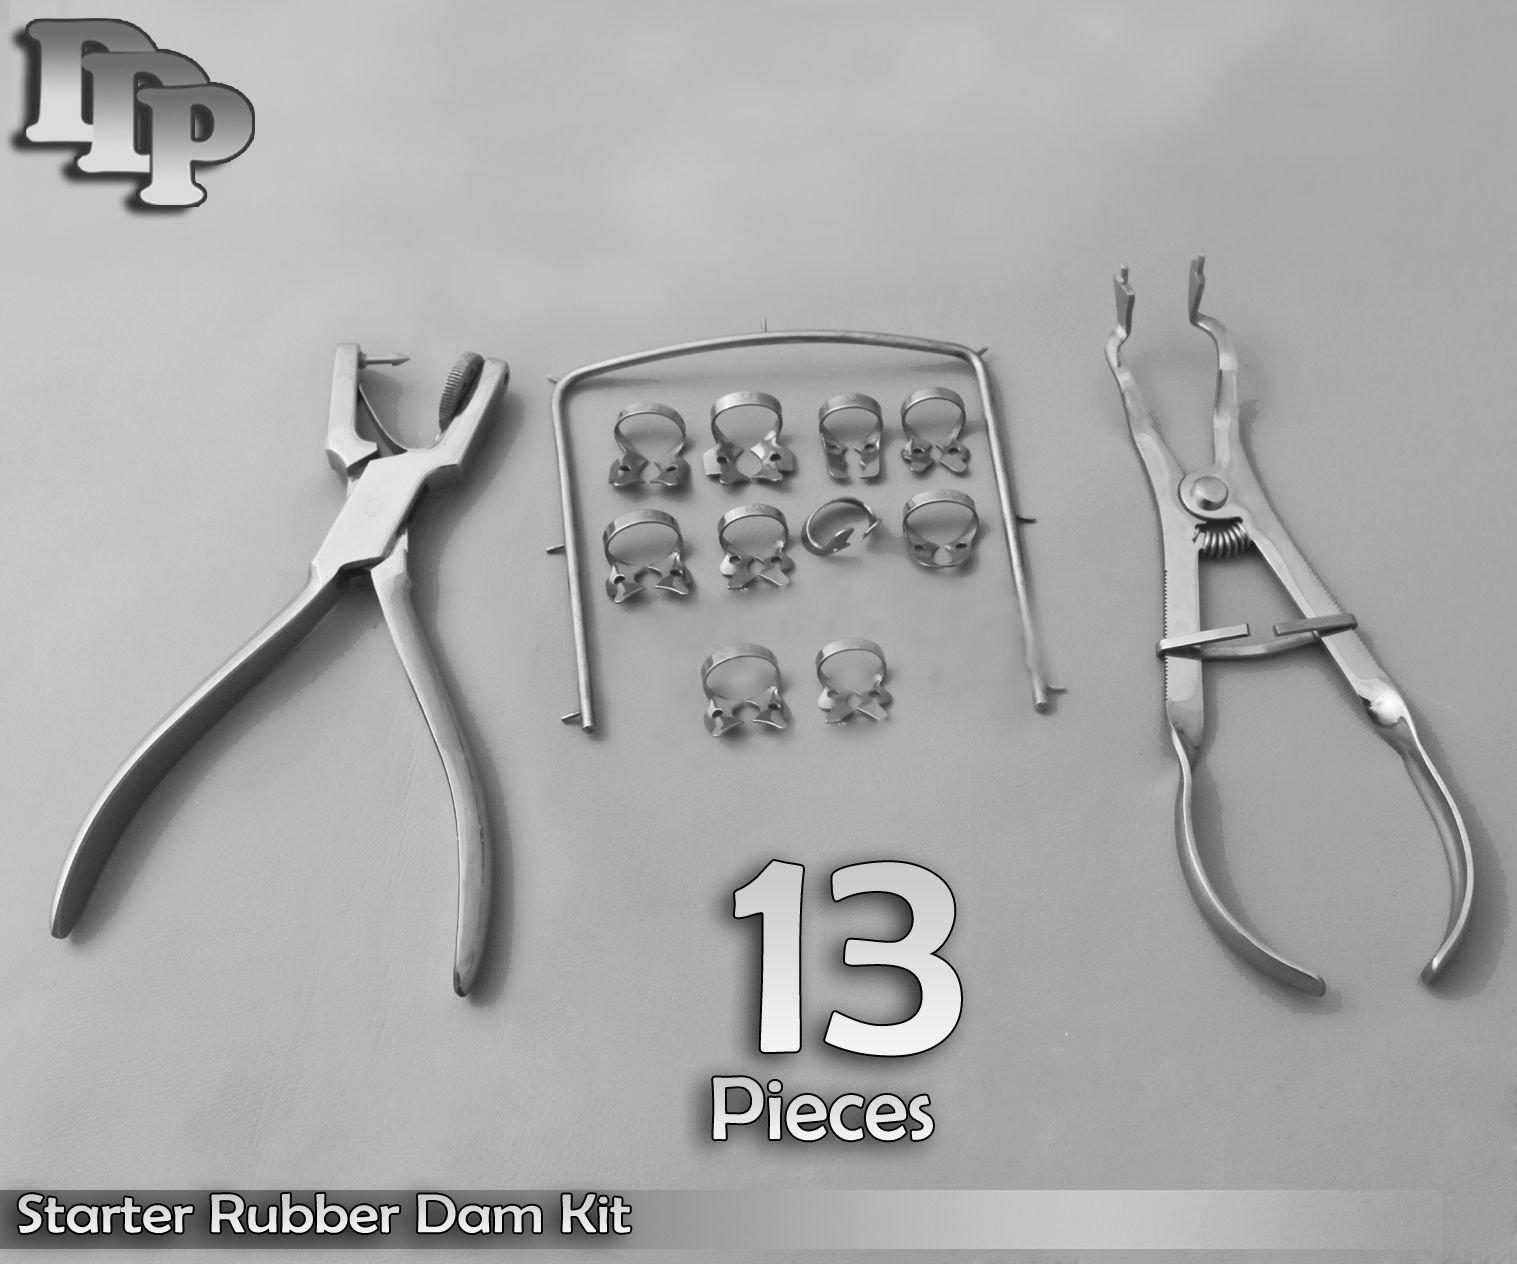 ODM Starter Rubber Dam Kit of 13, Clamps, Forceps, Frame, Punch